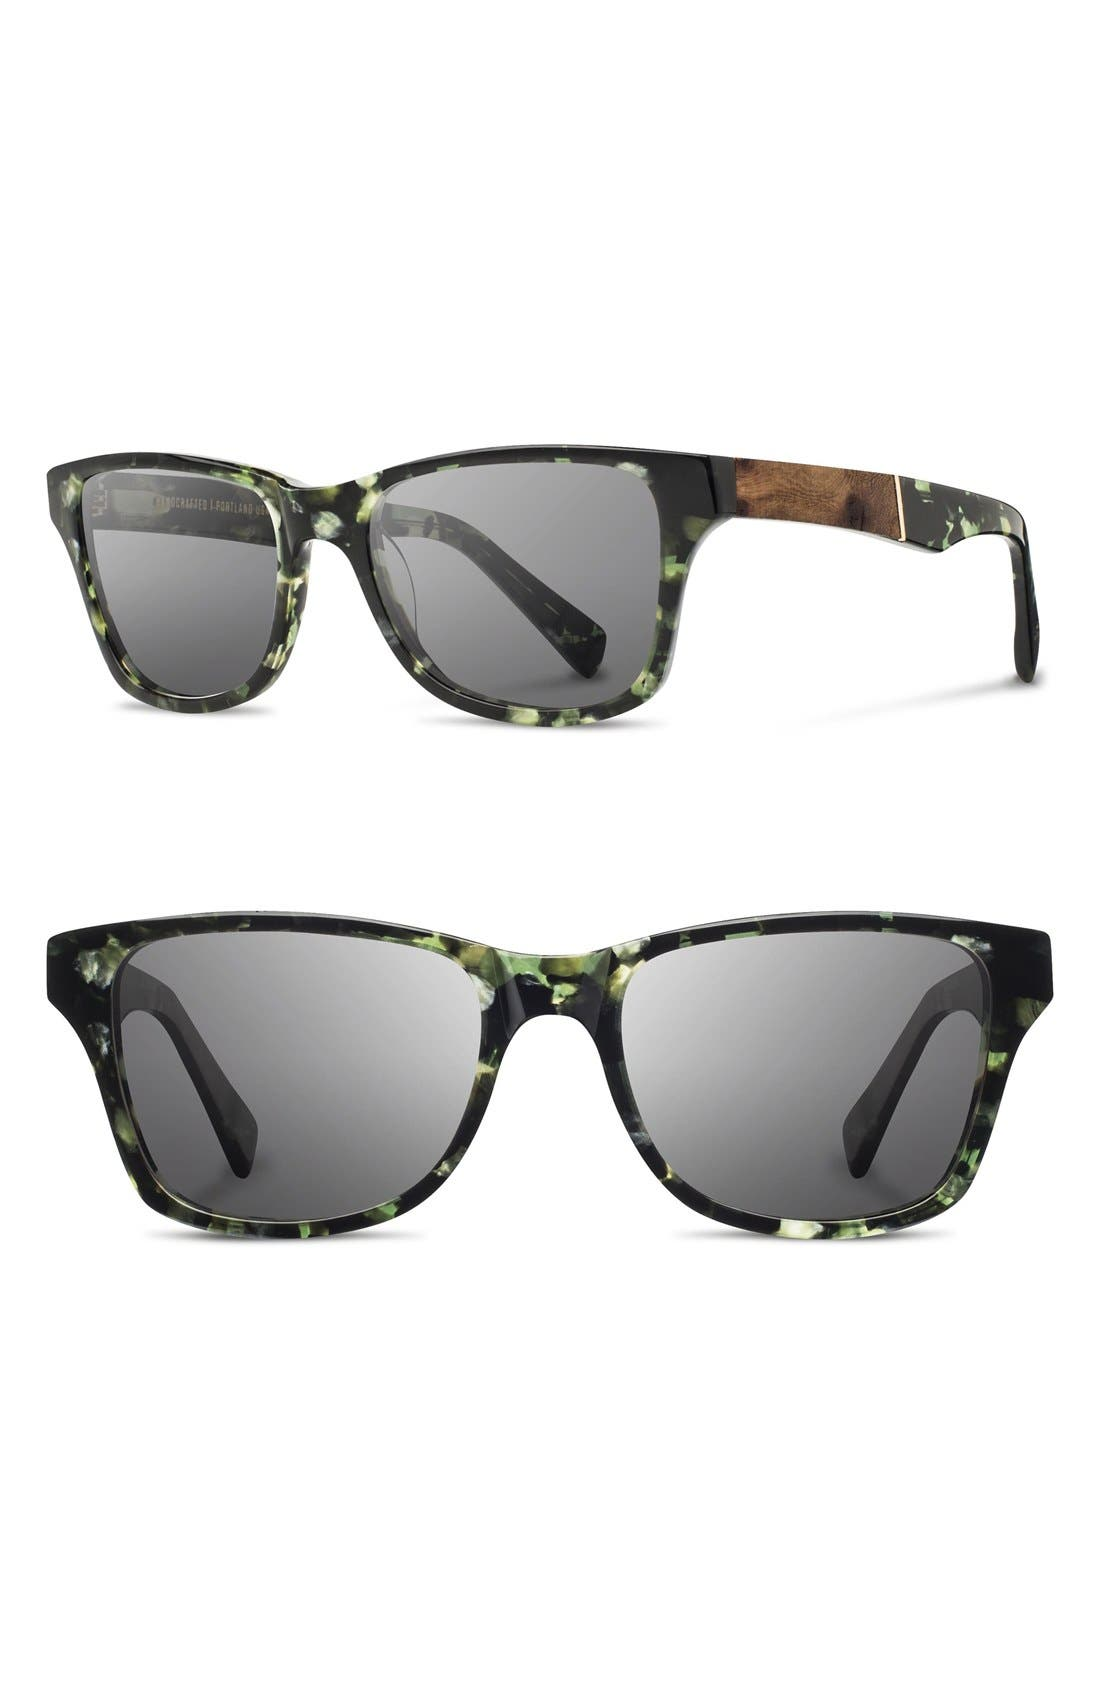 Polarized Wood Inlay Sunglasses,                         Main,                         color, Darkforest/ Elm/ Grey Polar